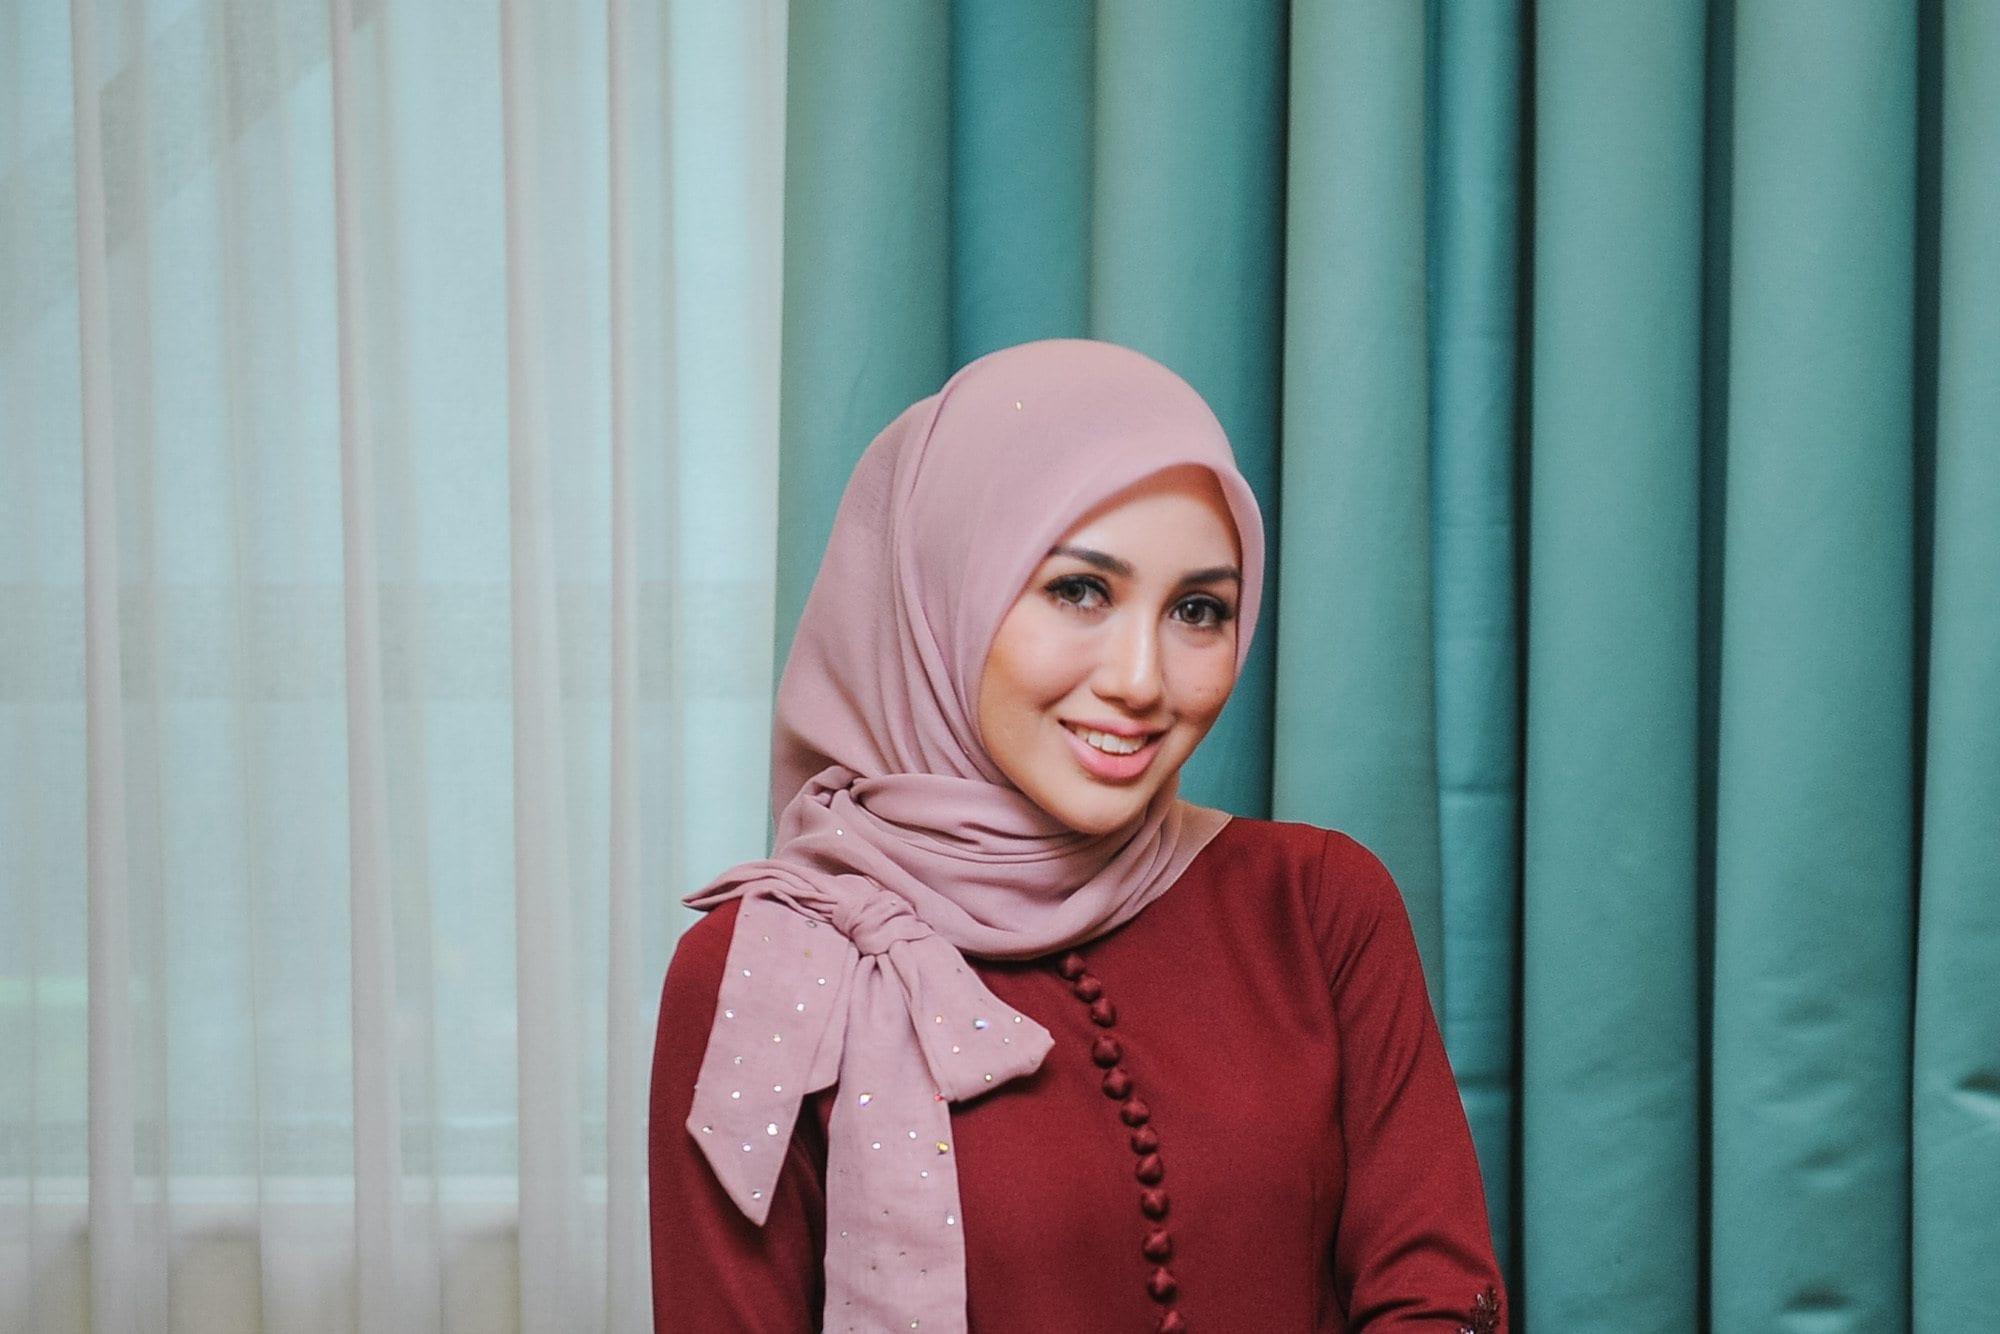 Wanita Asia memakai model hijab formal aksen pita